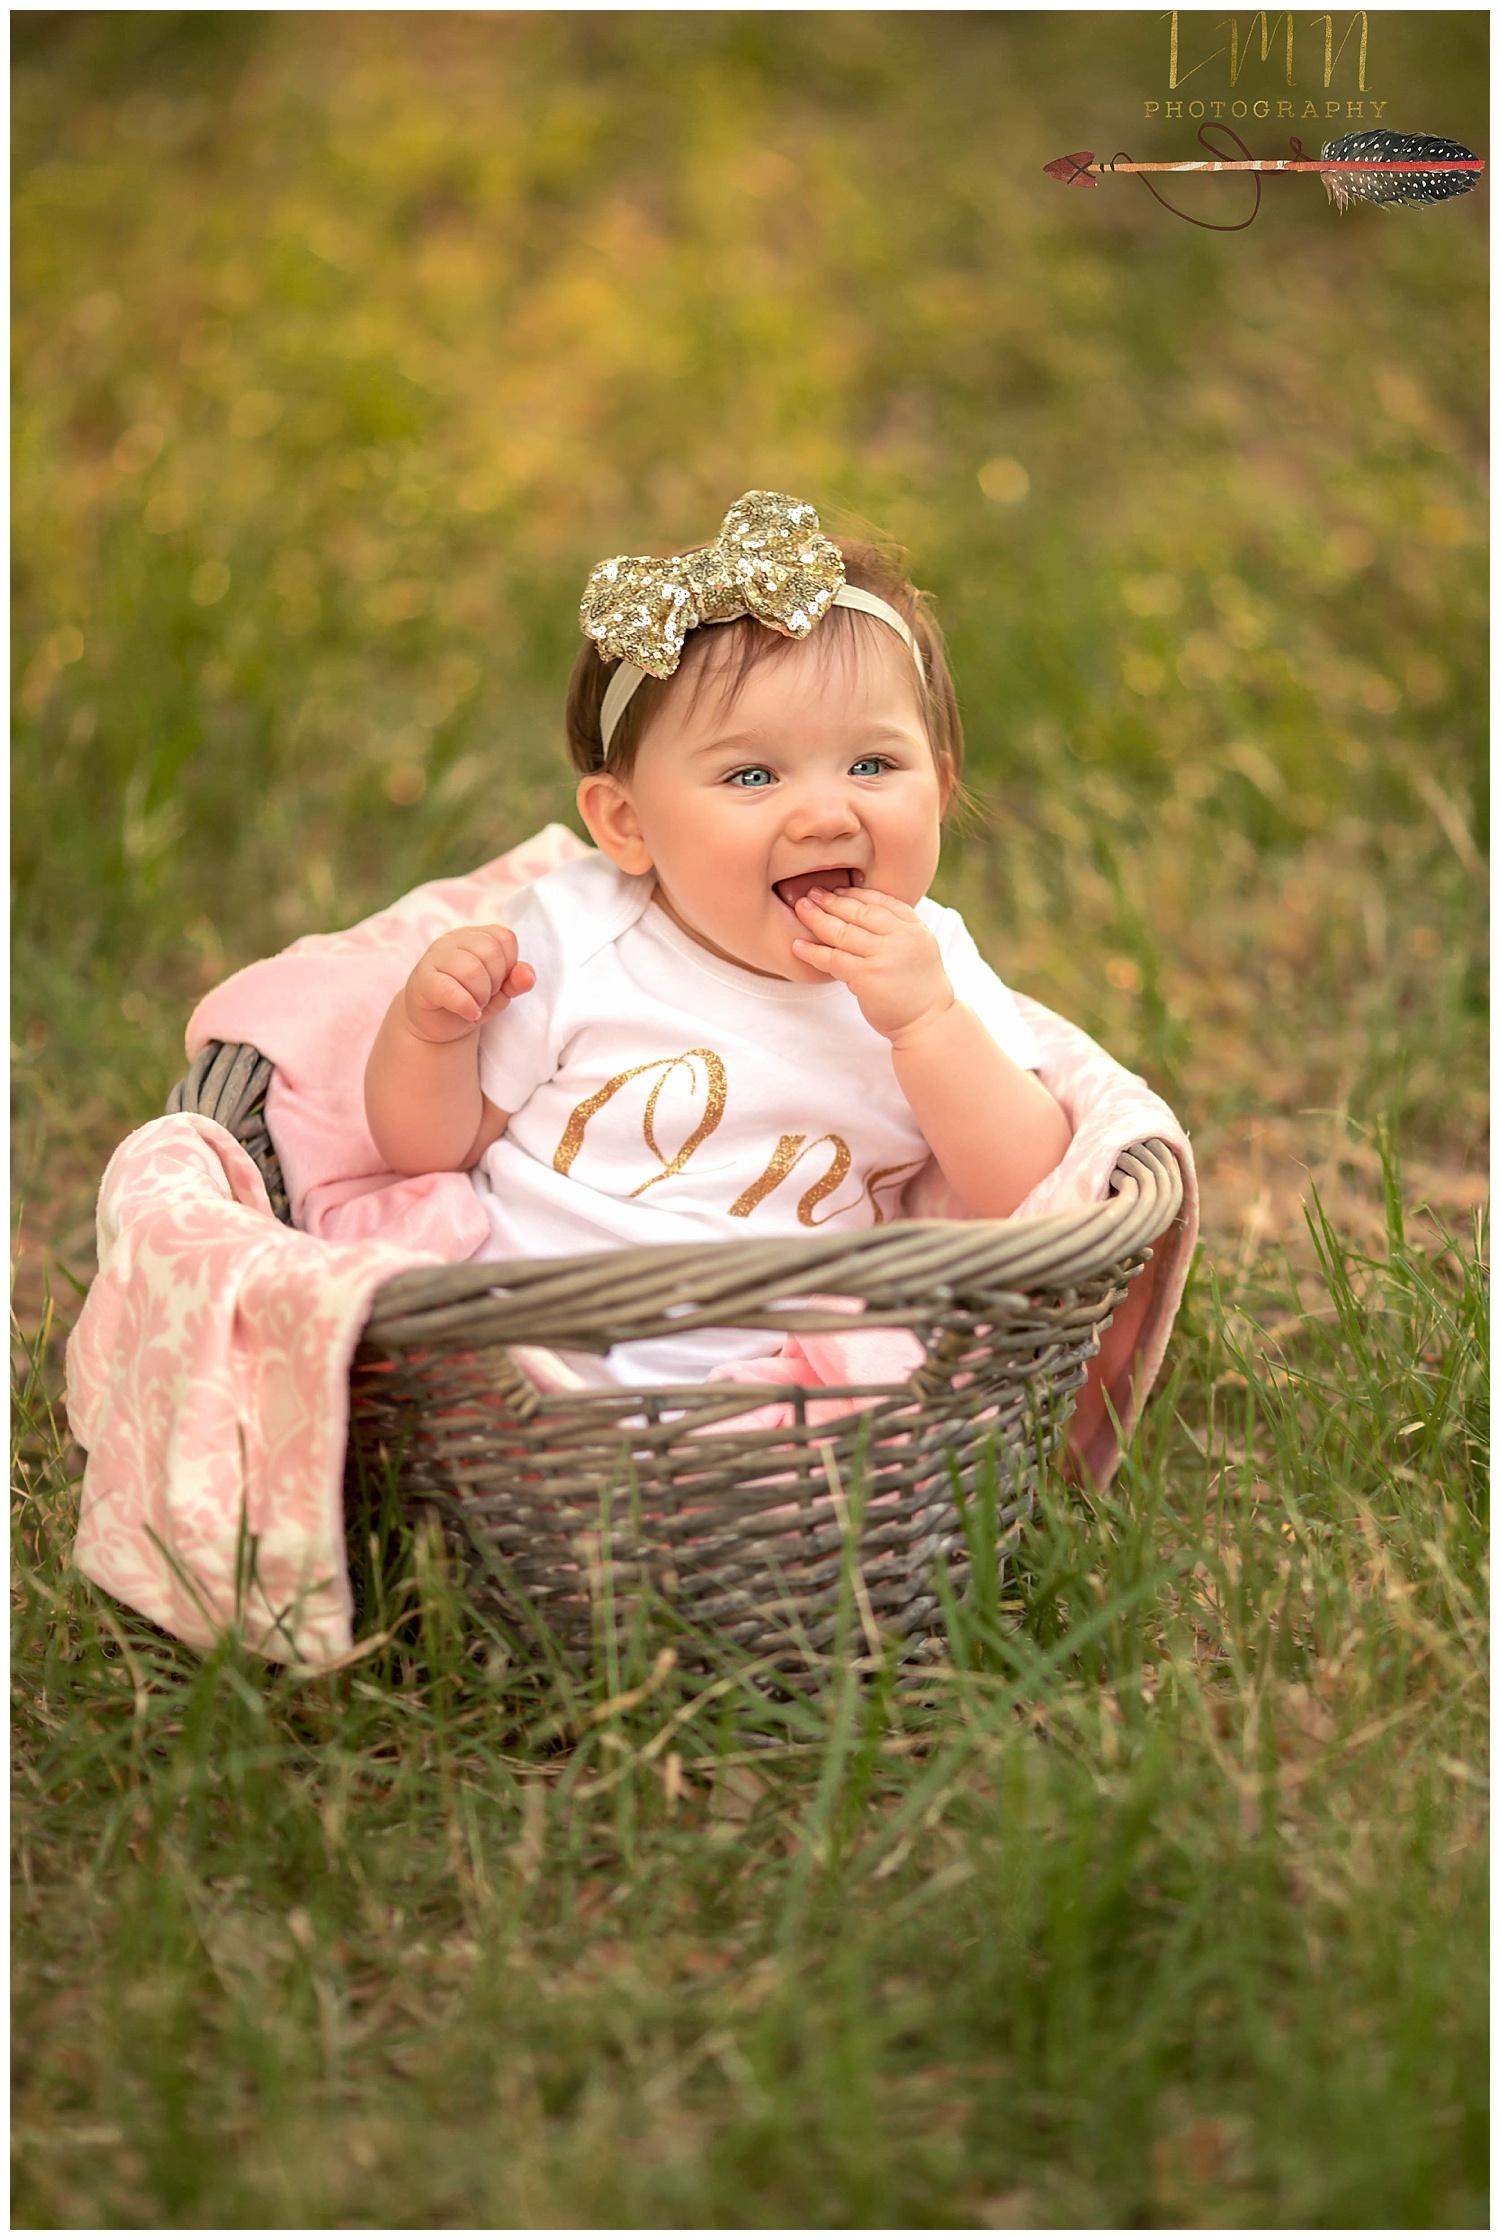 Cypress Children's Photography 77433 77429